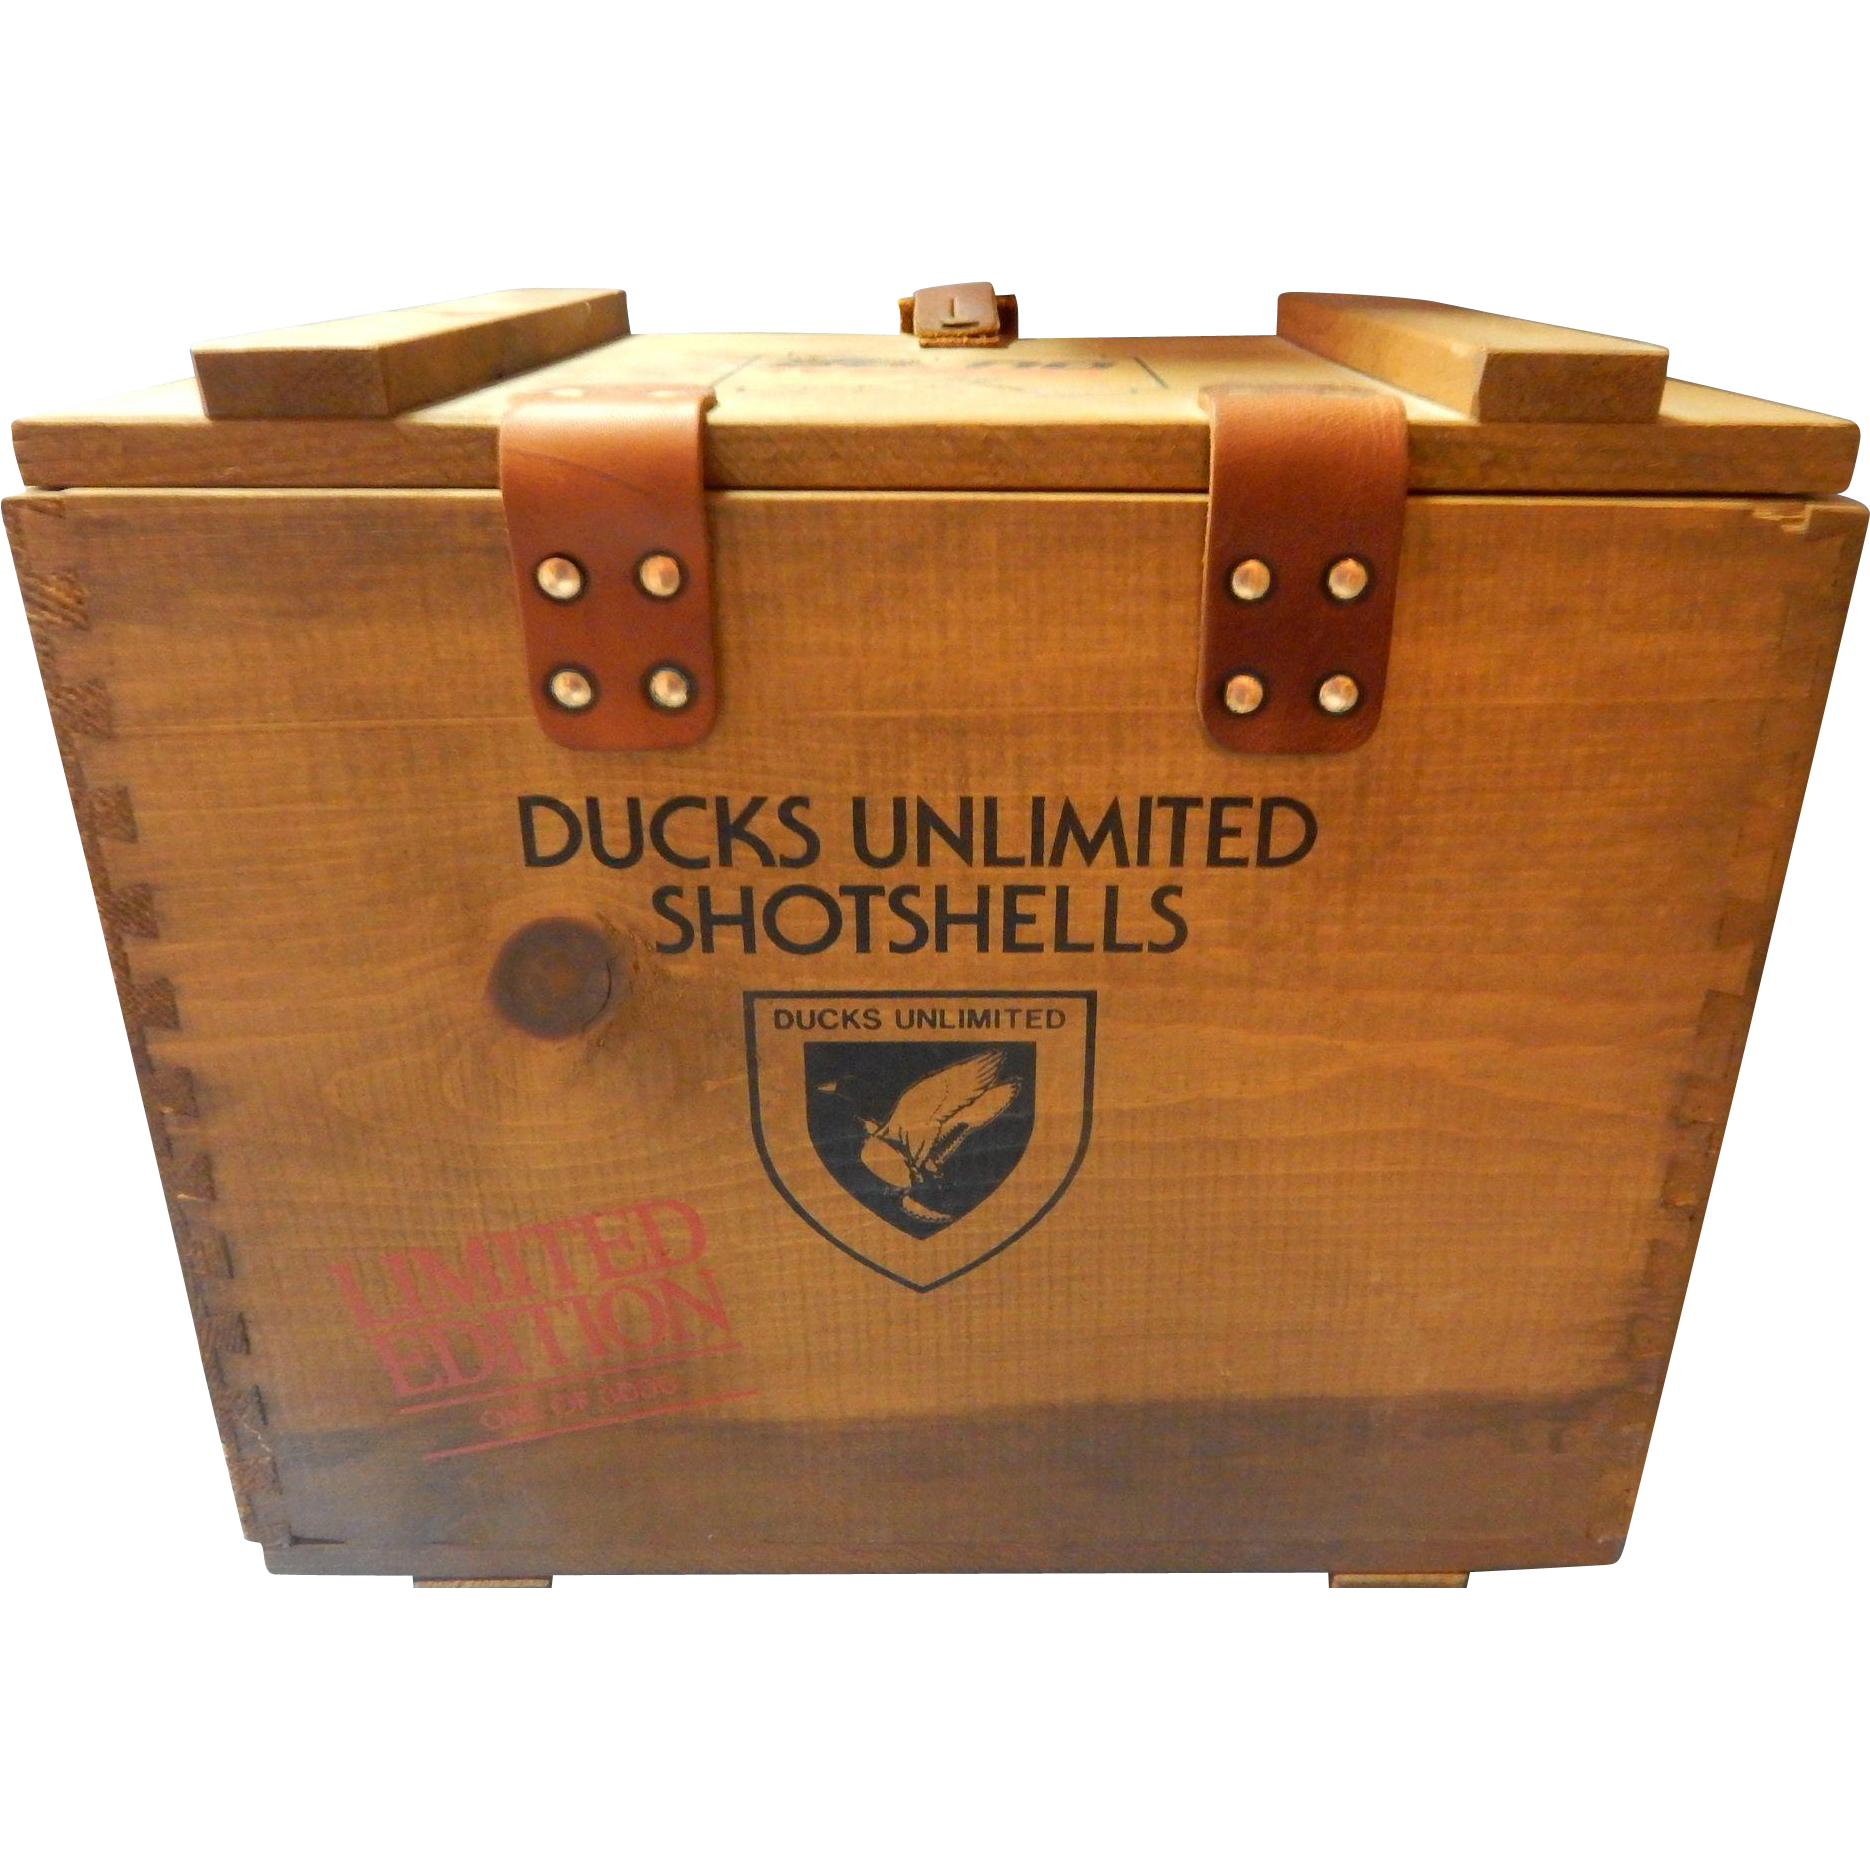 1982 Ducks Unlimited Shotshells Federal Gunner's Box 1 OF 3000